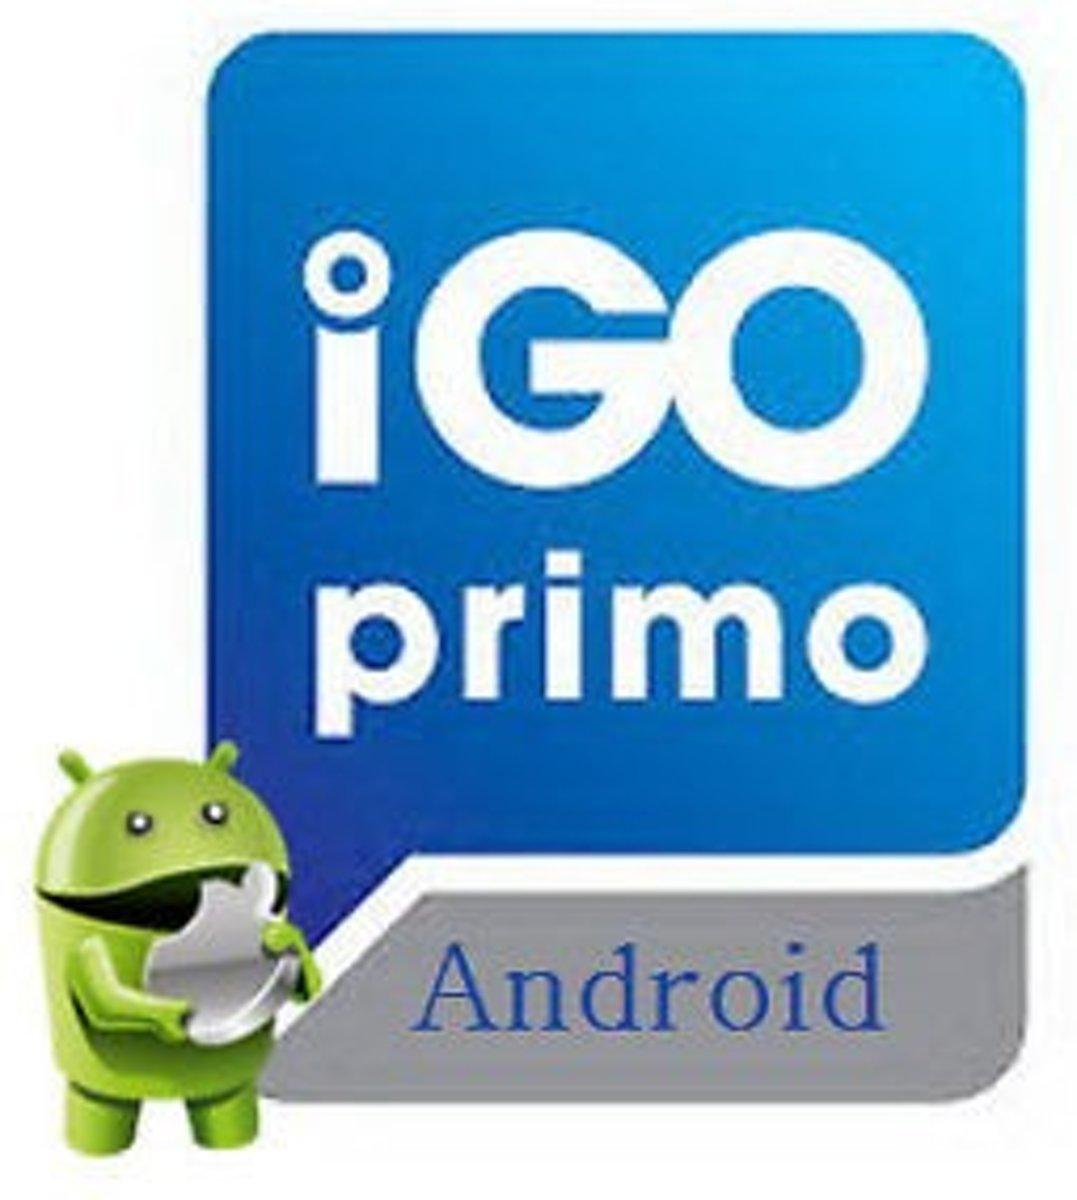 IGO Android kopen